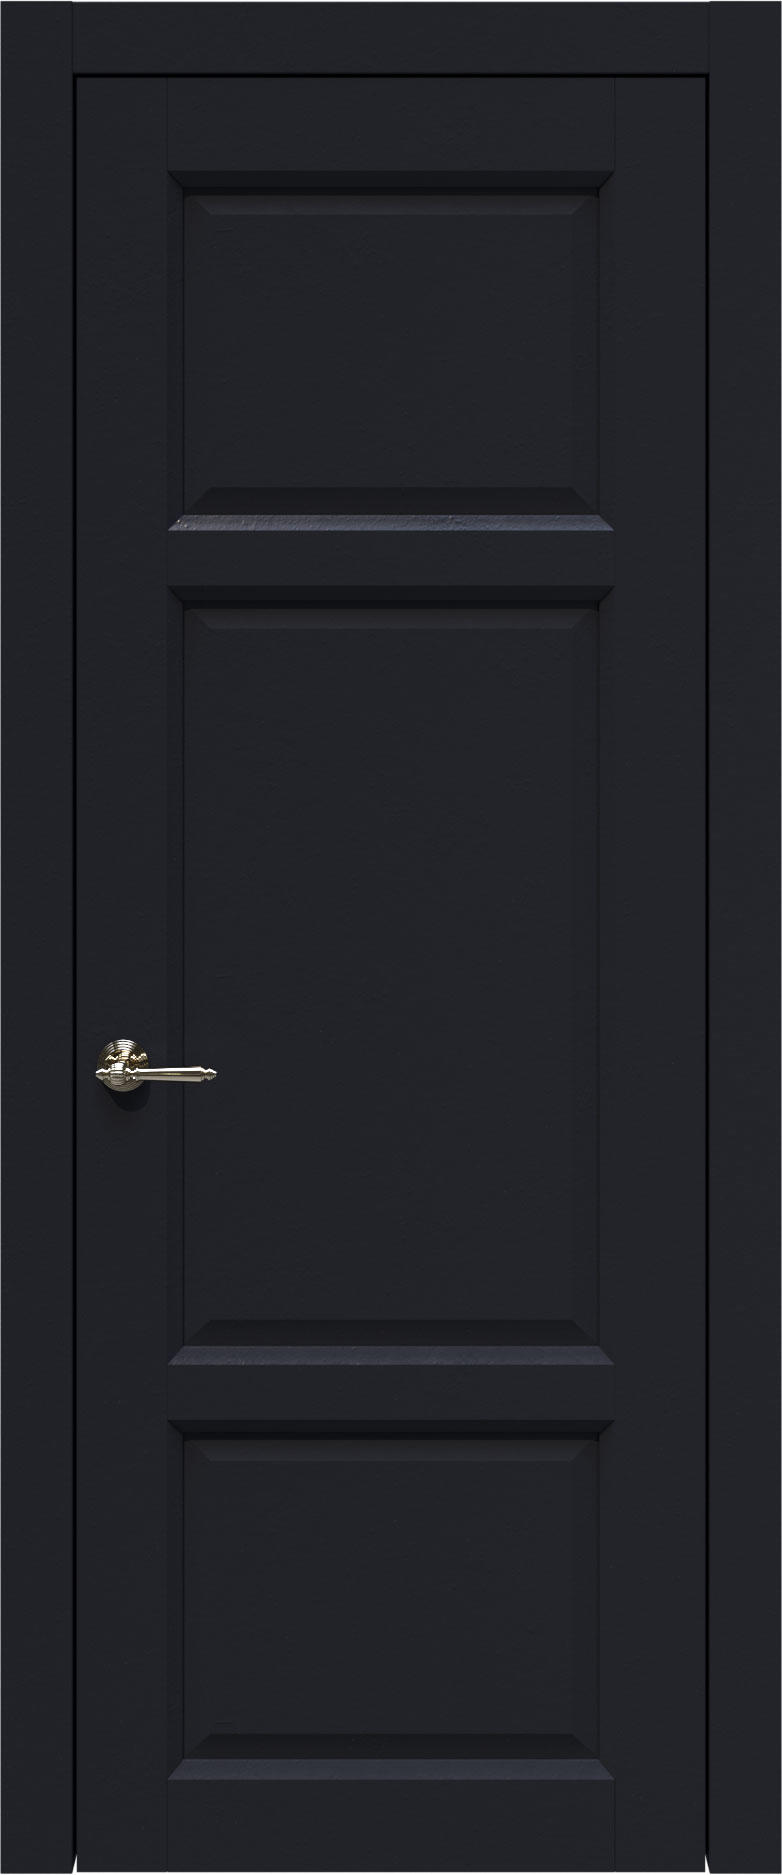 Siena цвет - Черная эмаль (RAL 9004) Без стекла (ДГ)